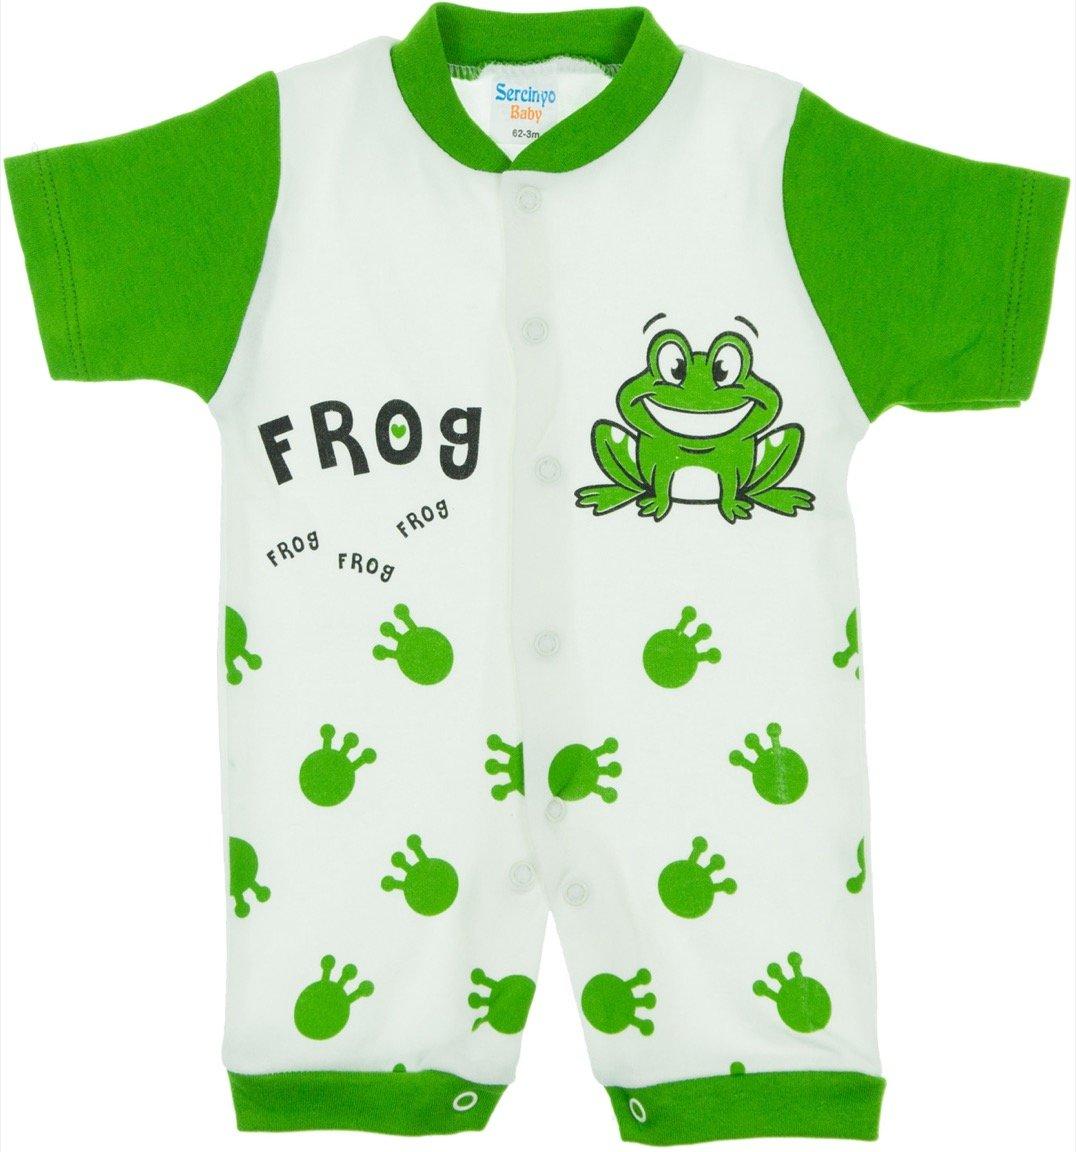 Sercinyo βρεφικό φορμάκι «Green Frog»